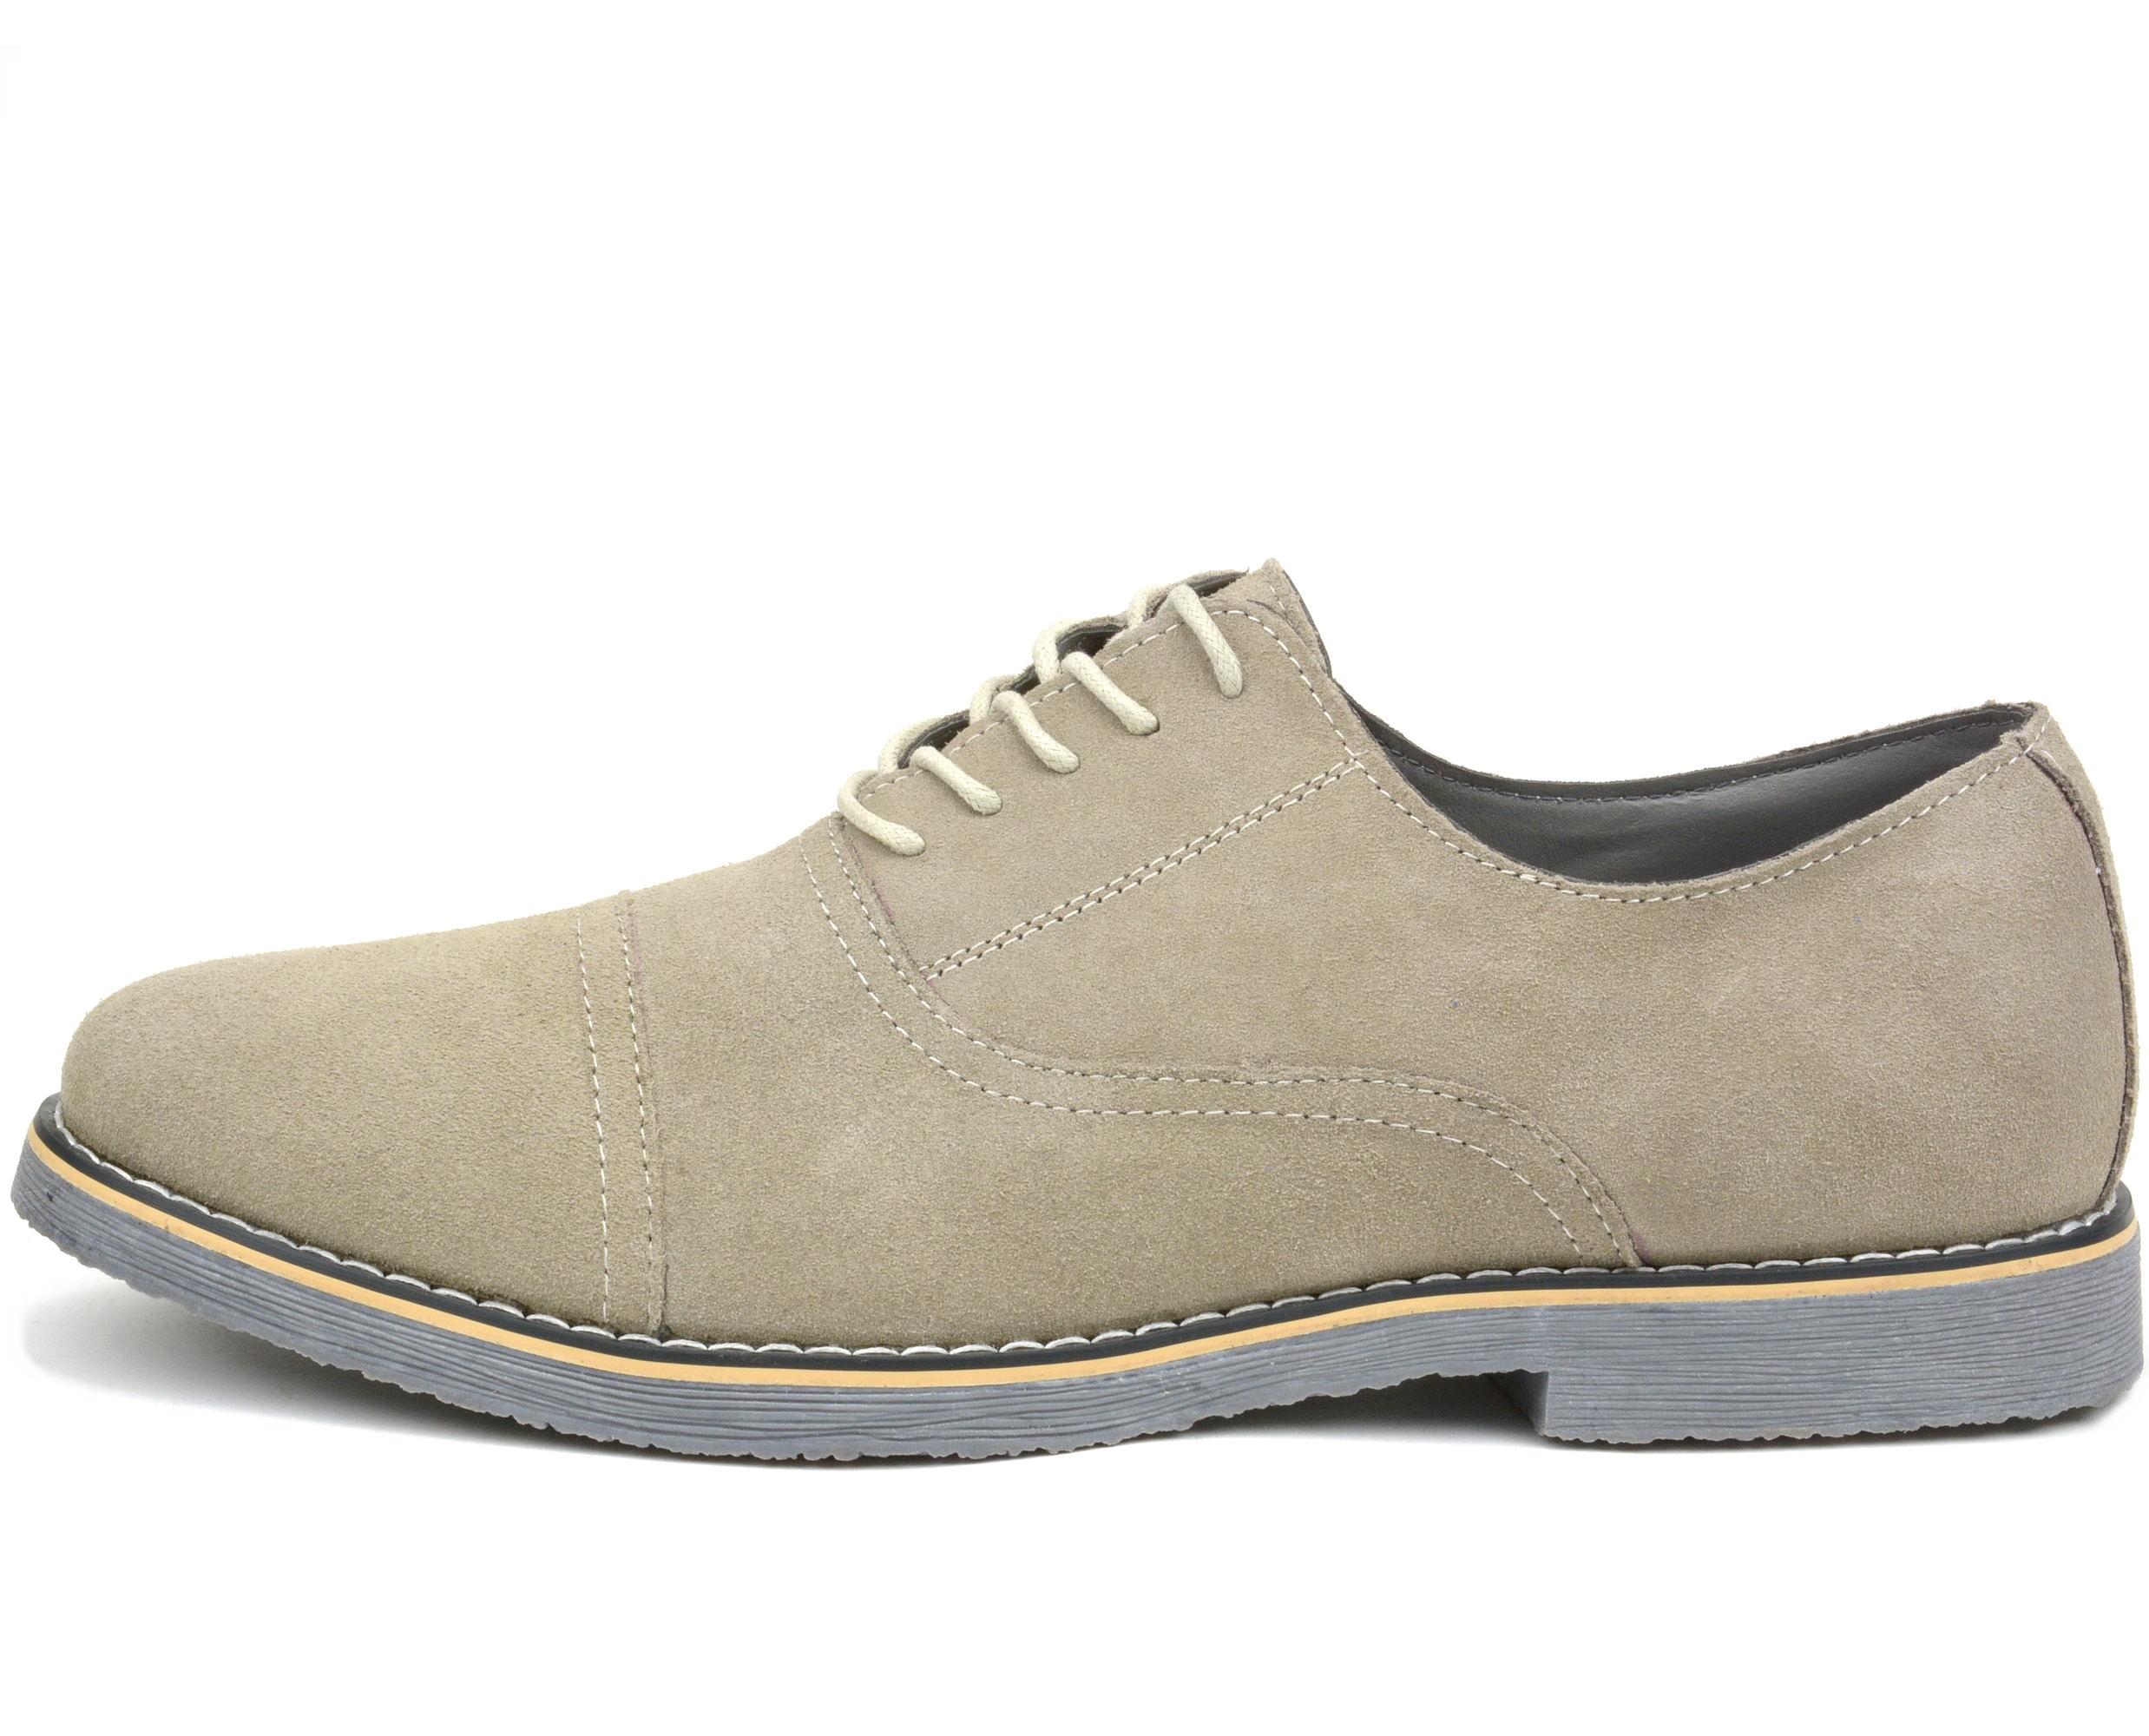 Formal Dress Shoes Oxfords